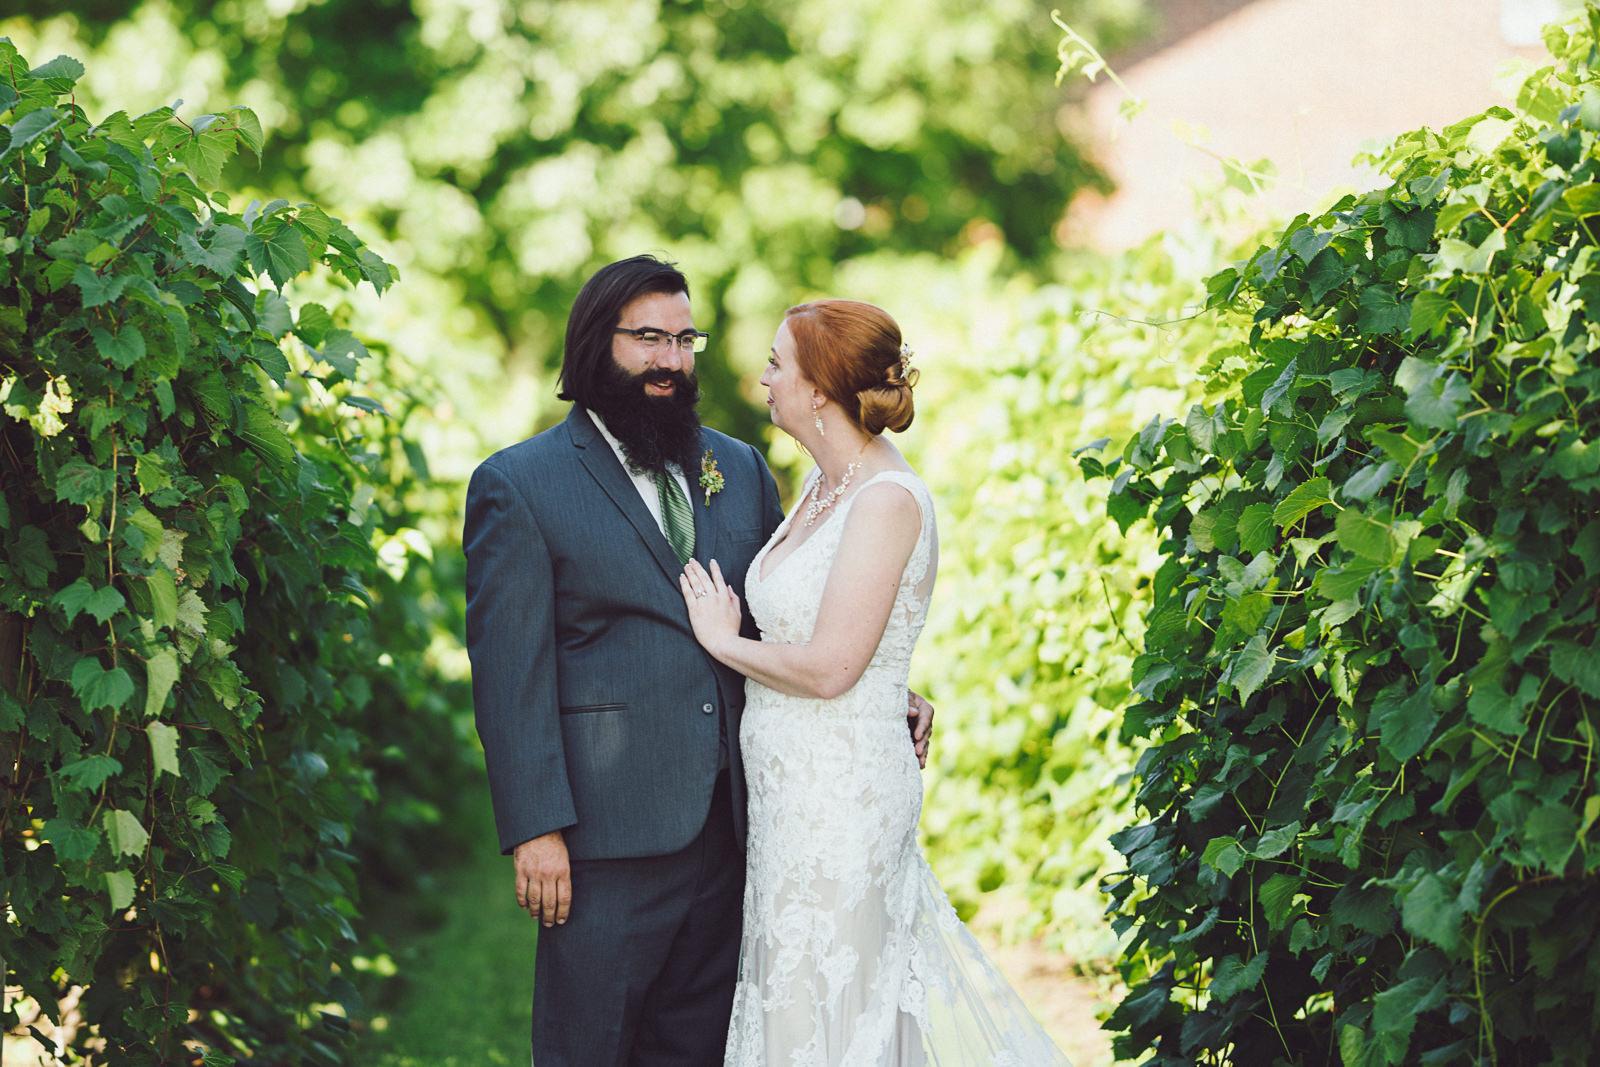 wedding-keely-caleb-202-name-your-photo.jpg